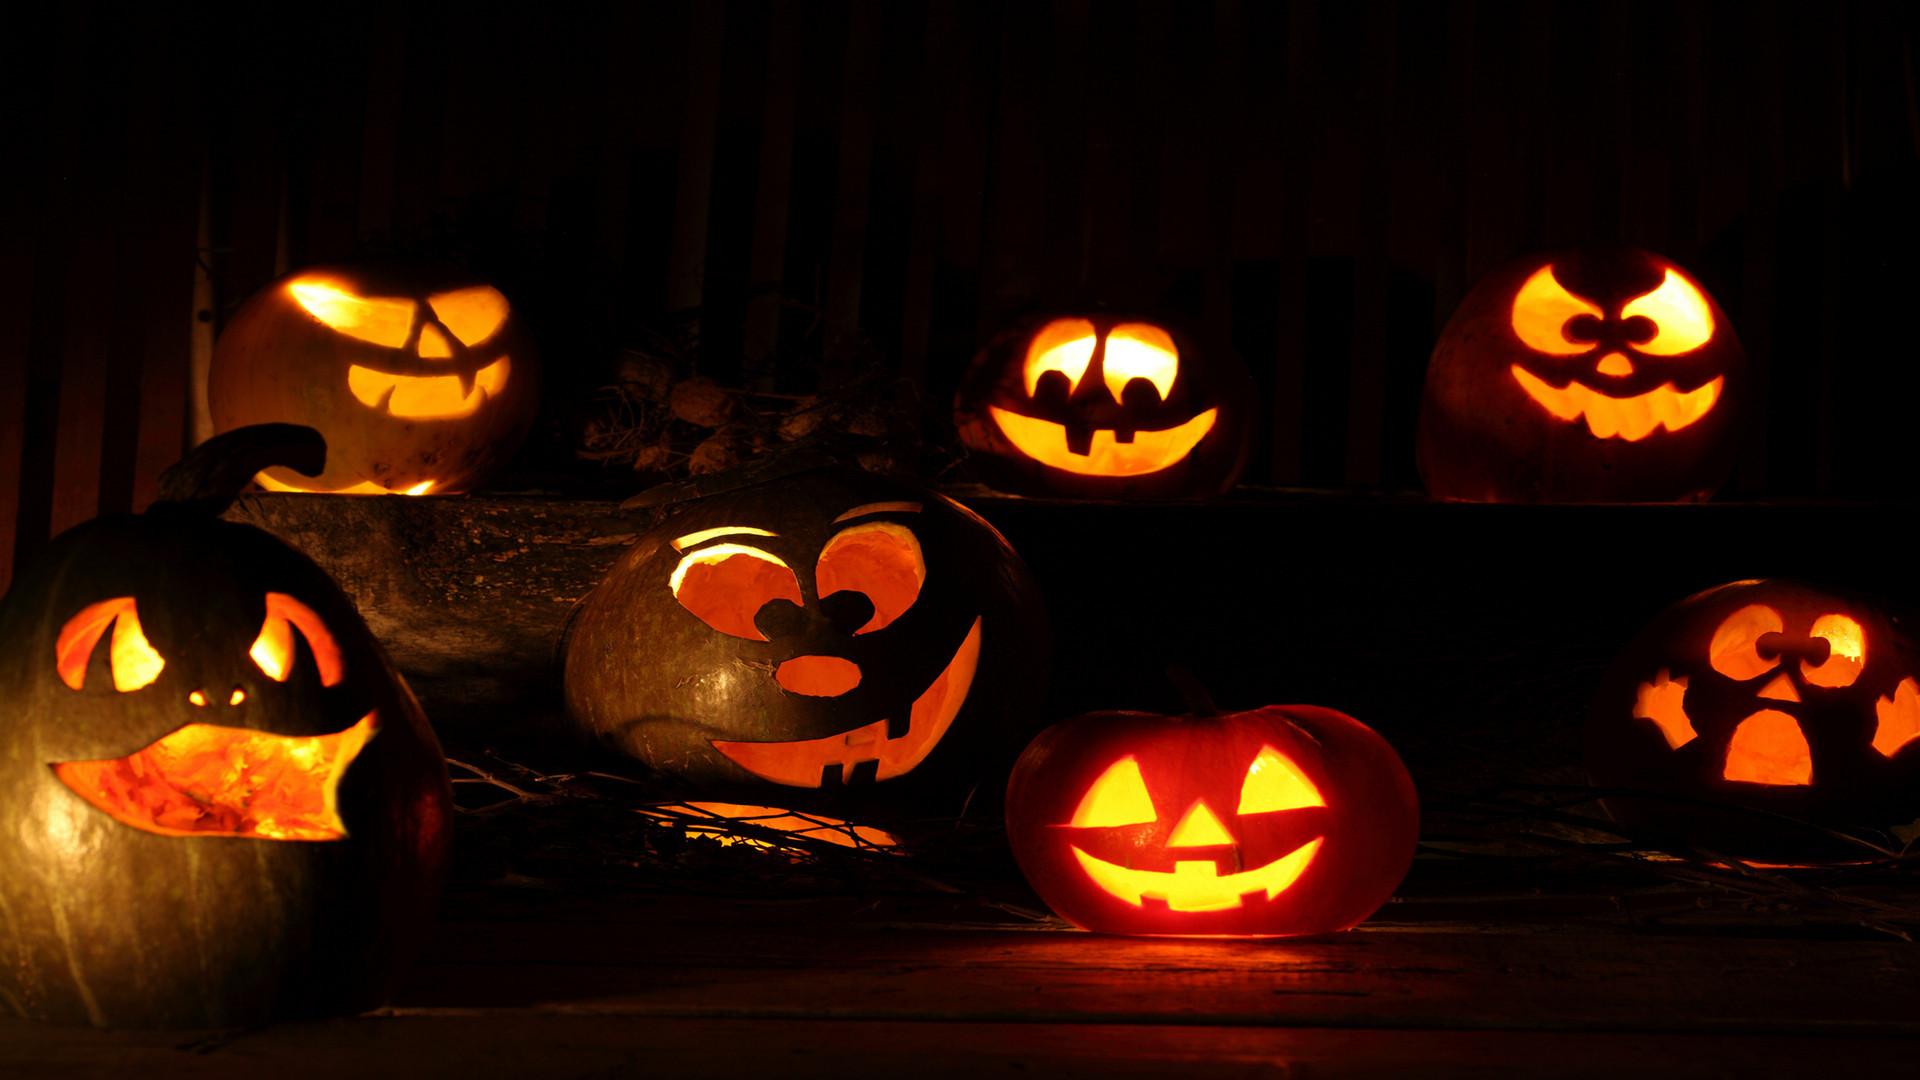 scary halloween pumpkin wallpapers Source · HD Halloween Wallpaper  WallpaperSafari